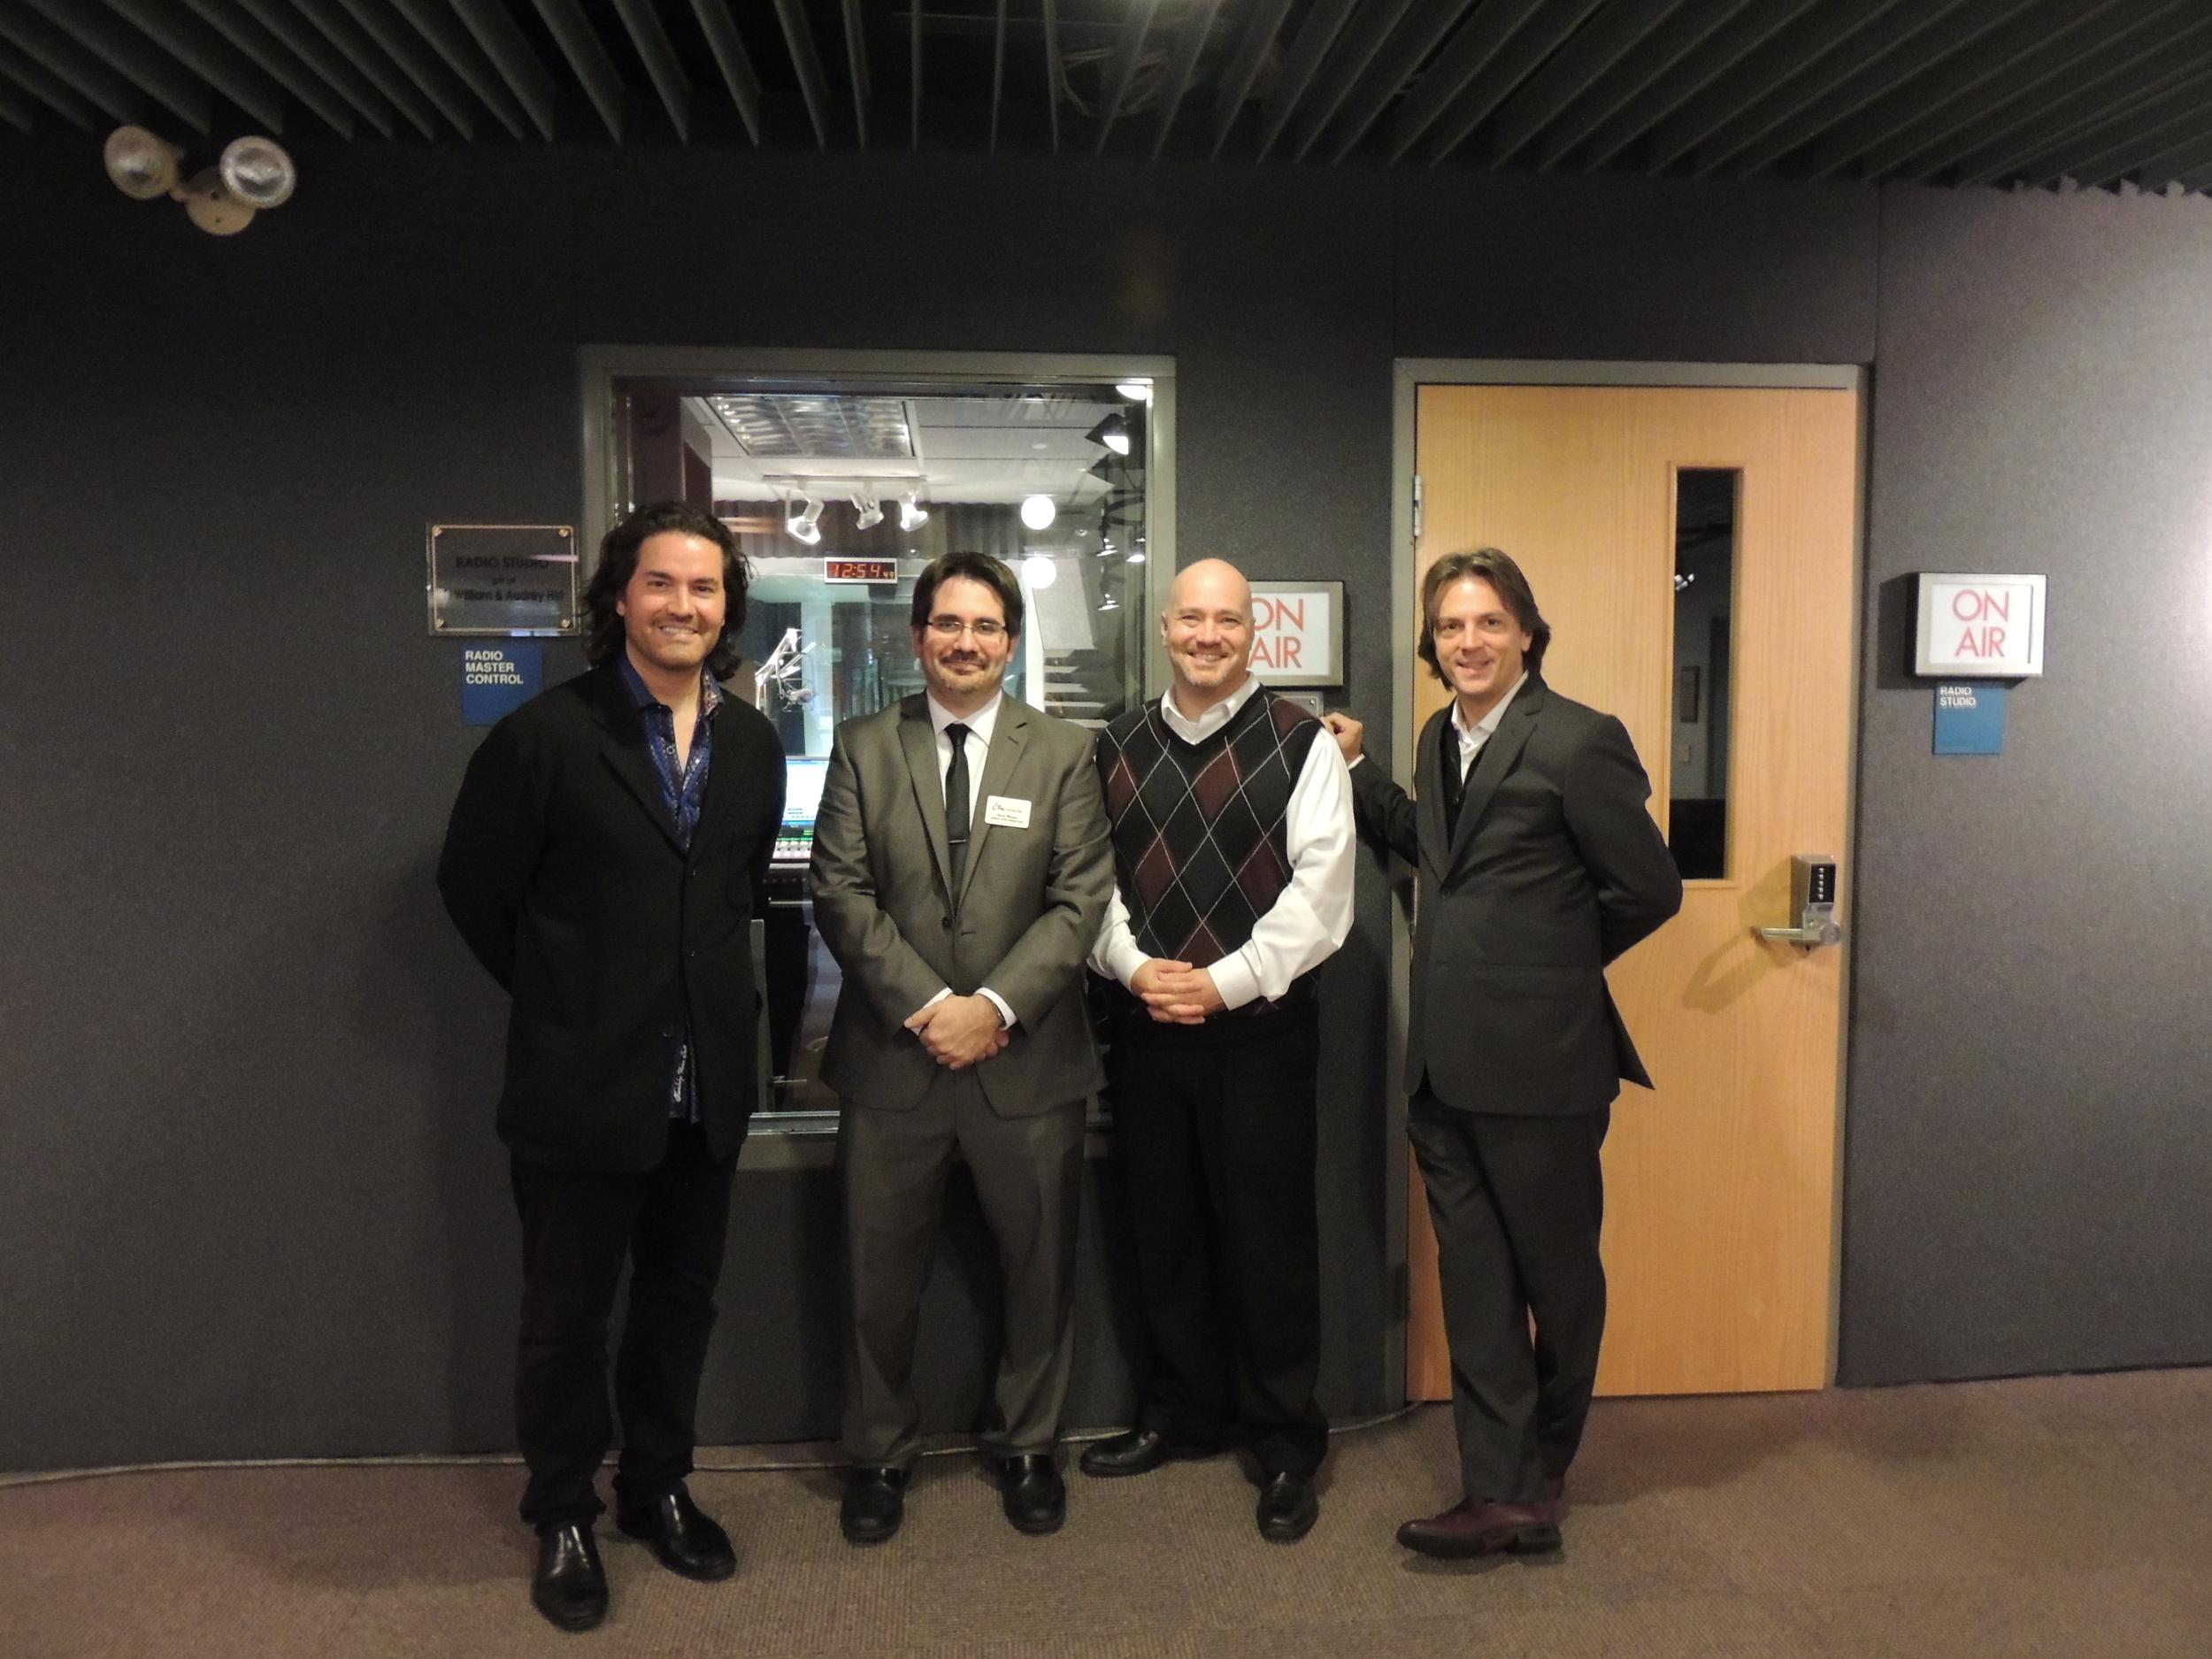 Soloist Zuill Bailey, Executive Director Steve Weiser, host Brian Hannah and Music Director Daniel Meyer